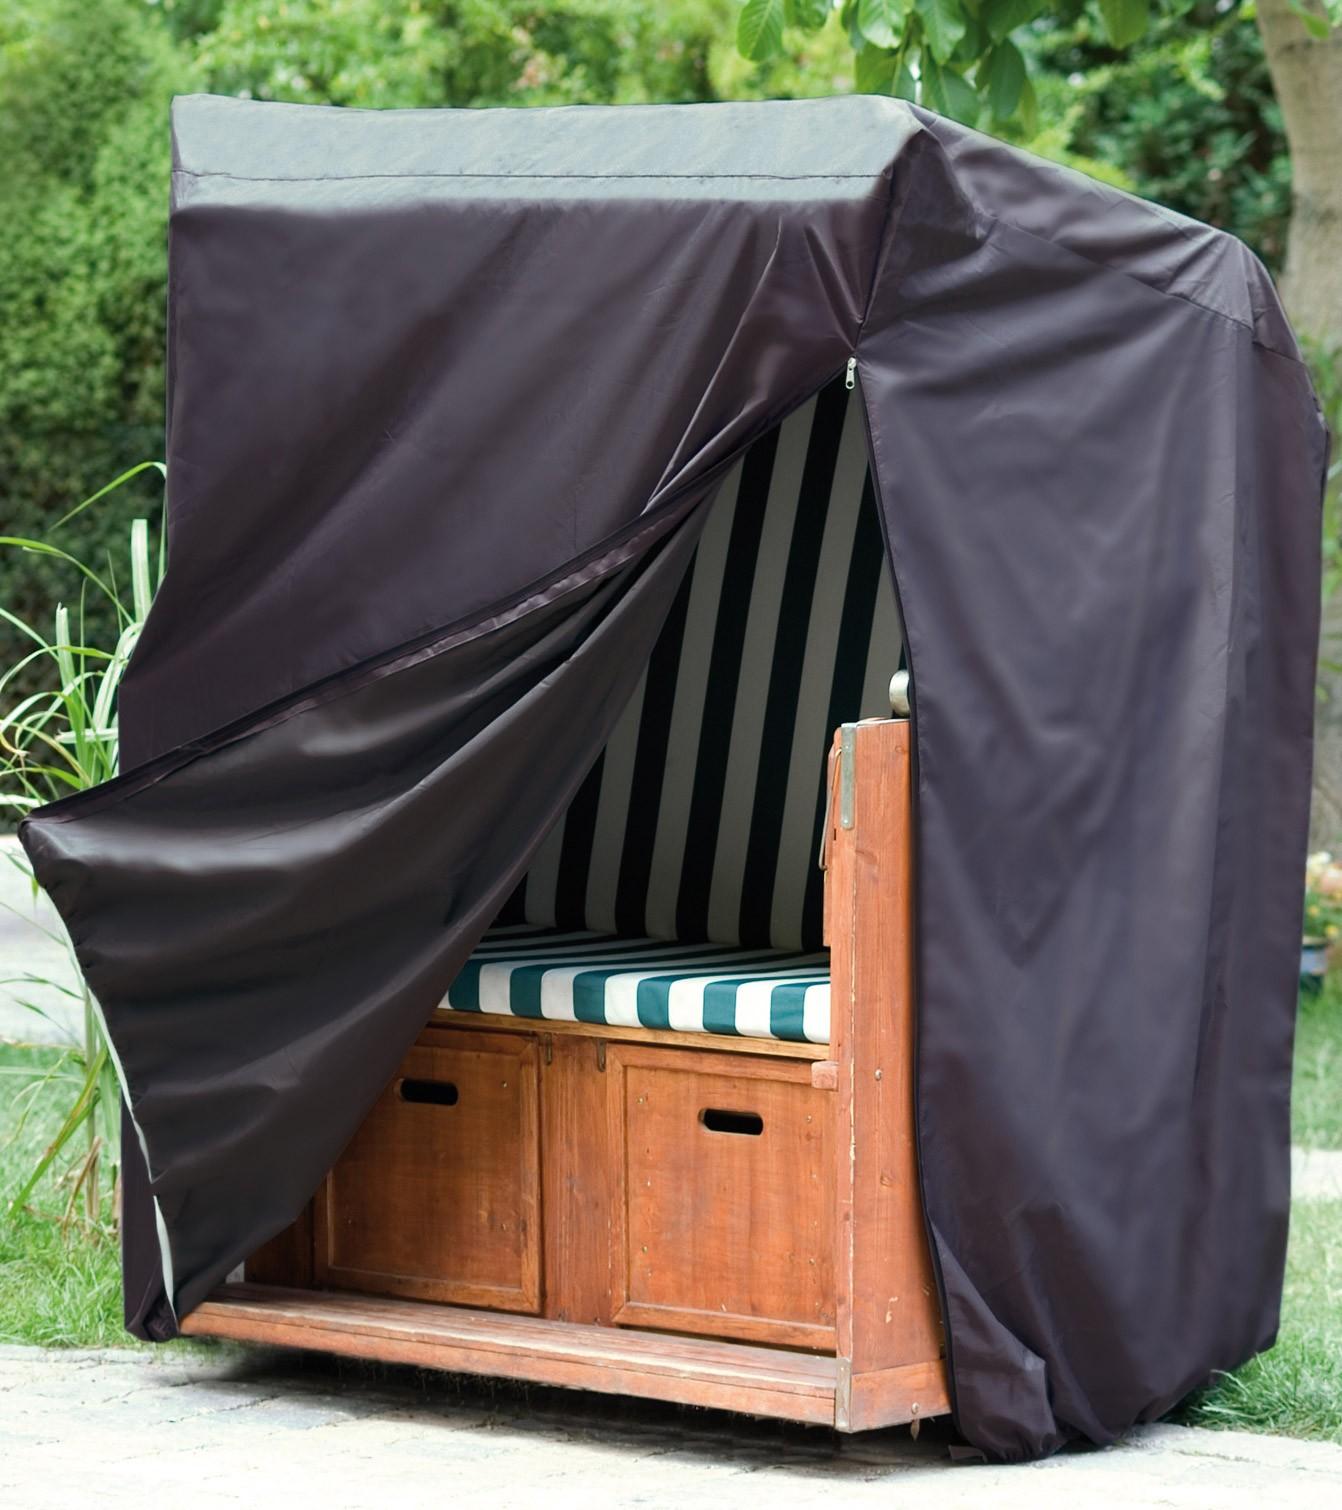 schutzh lle wehncke deluxe f r strandkorb 130x100x170cm. Black Bedroom Furniture Sets. Home Design Ideas